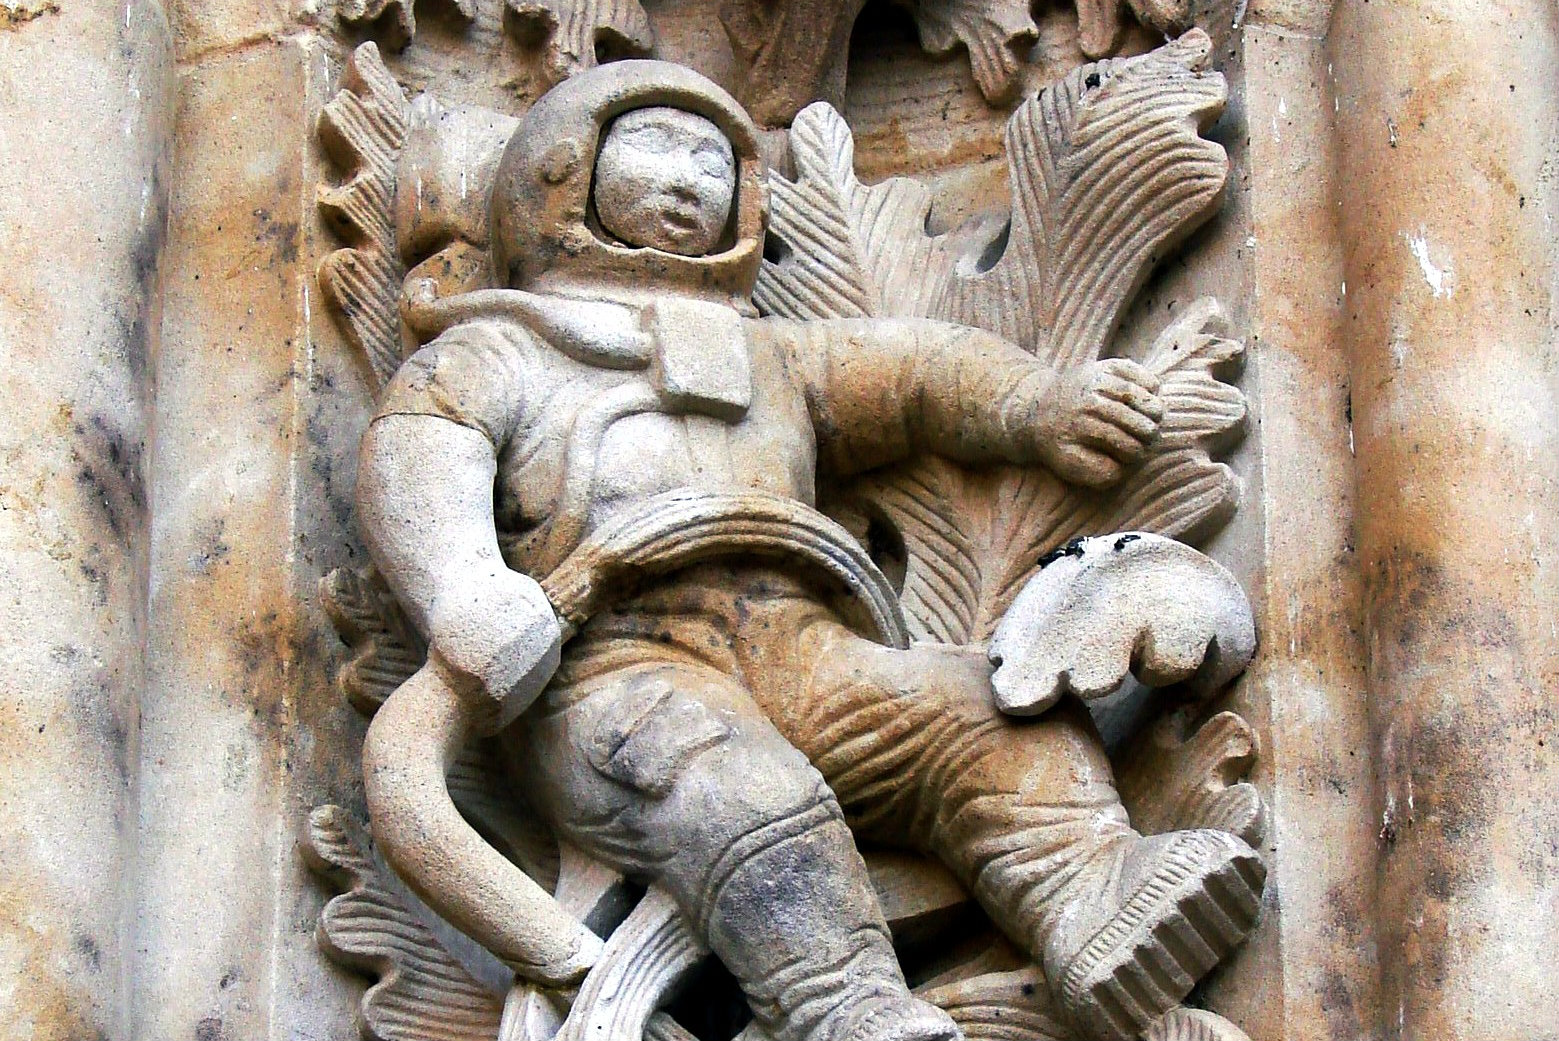 Sculpture_of_astronaut.jpg